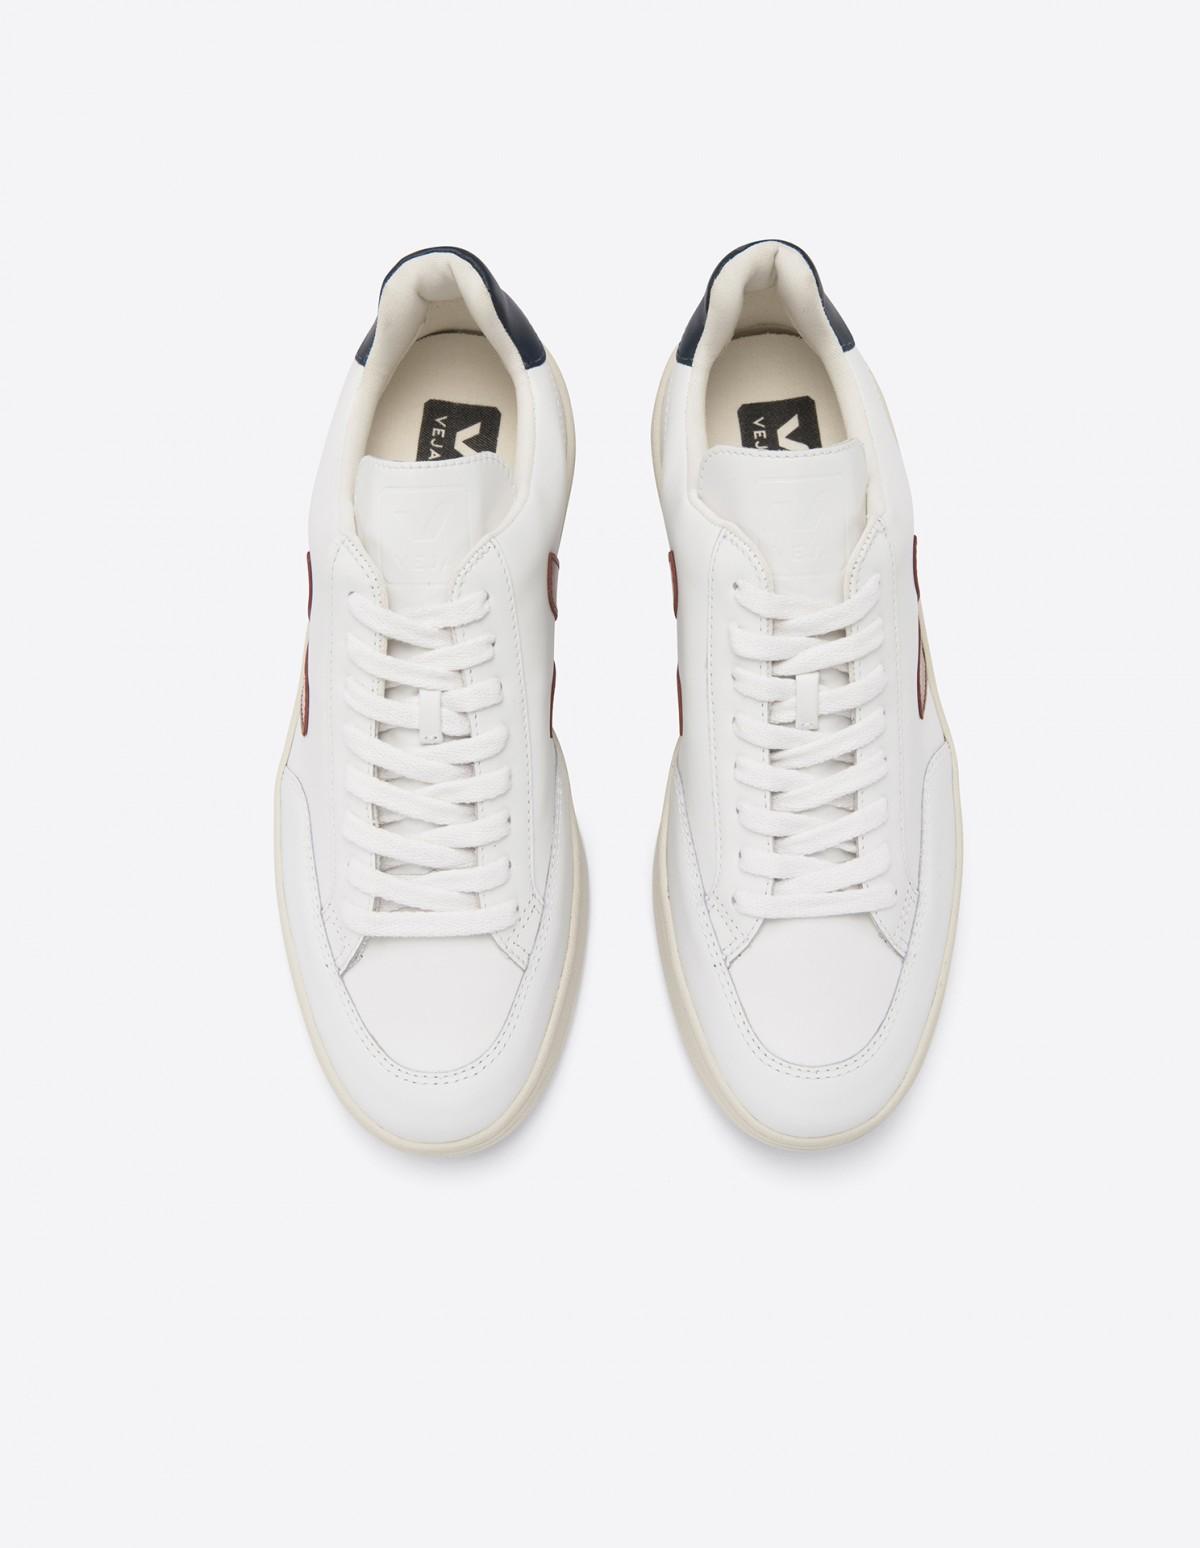 Veja V-12 Leather in Extra White Marsala Nautico